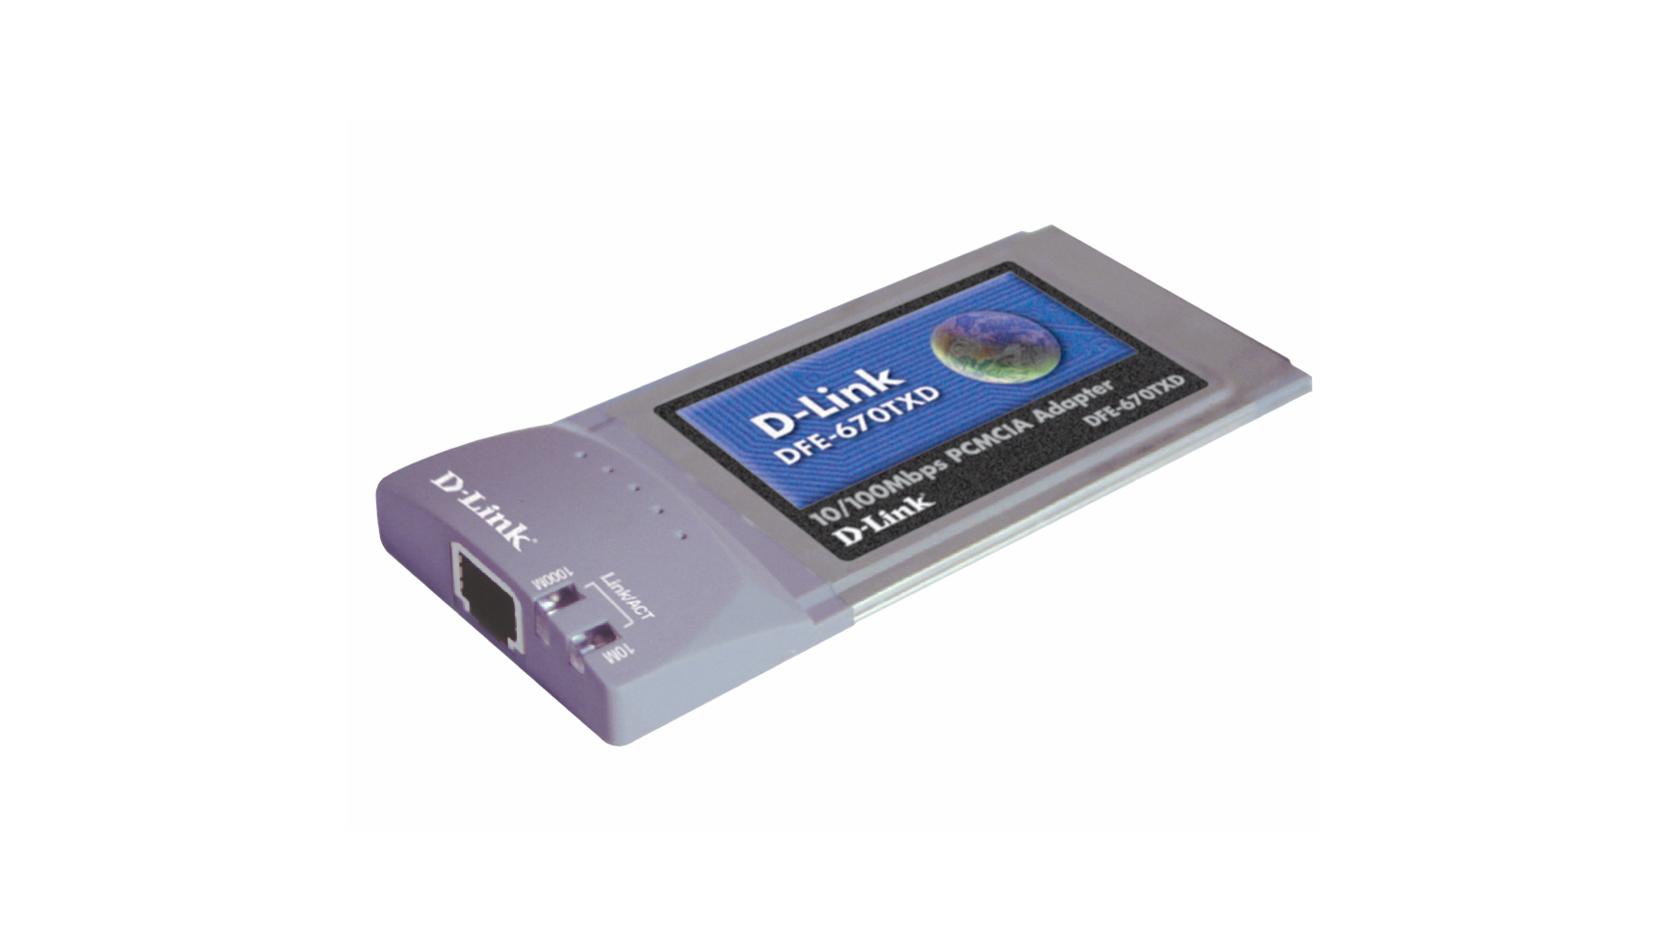 DLINK DFE-670TXD DRIVER FOR WINDOWS 10